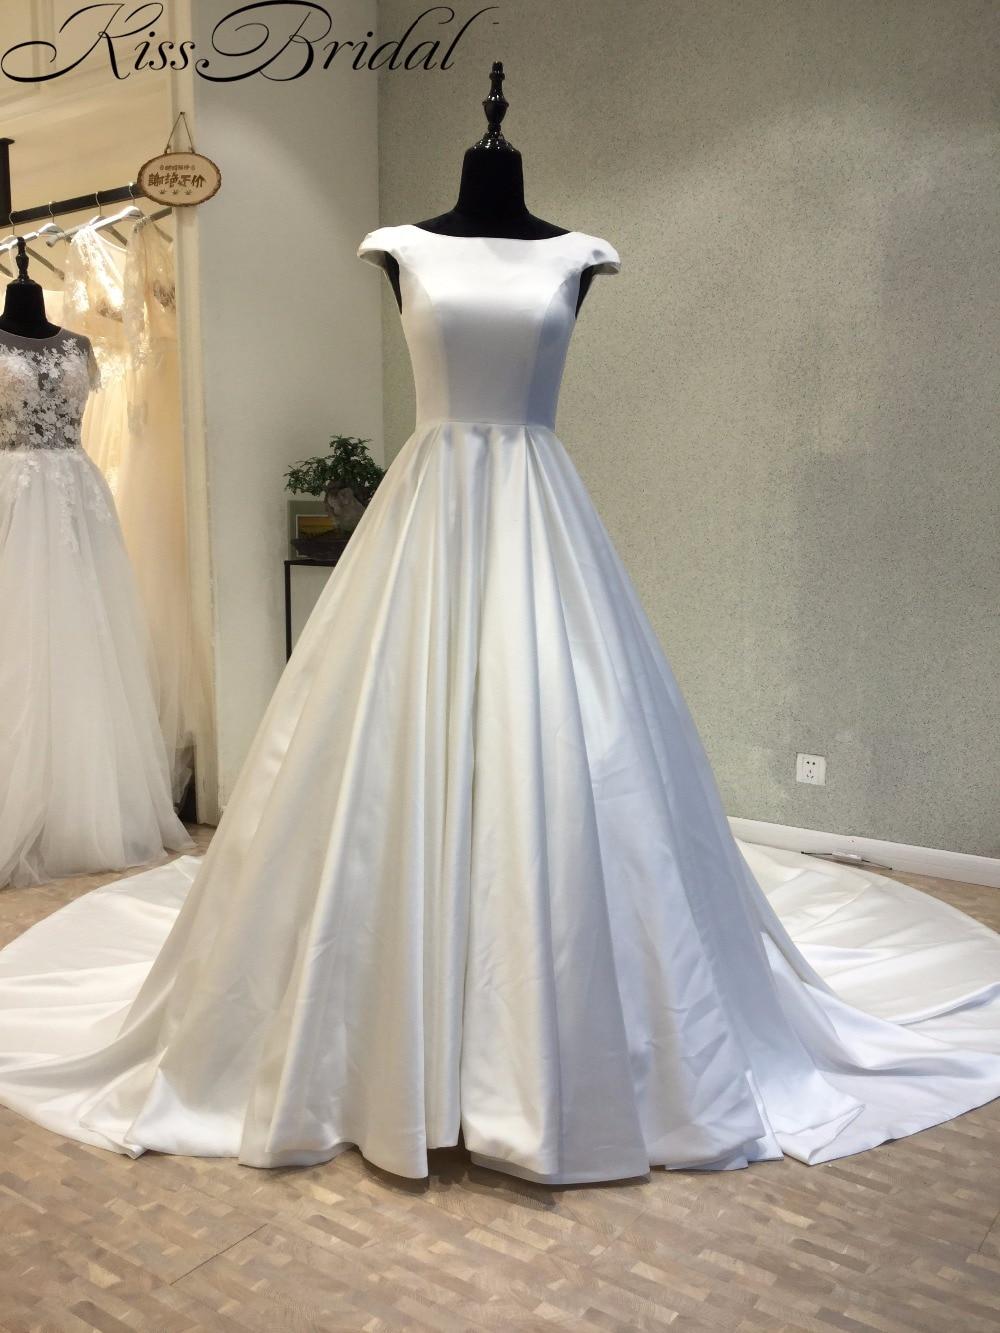 Fashionable Cheap Wedding Dress 2018 Open Corset Back Satin Bride Dresses A line Long Trains vestidos - Cheap Wedding Items